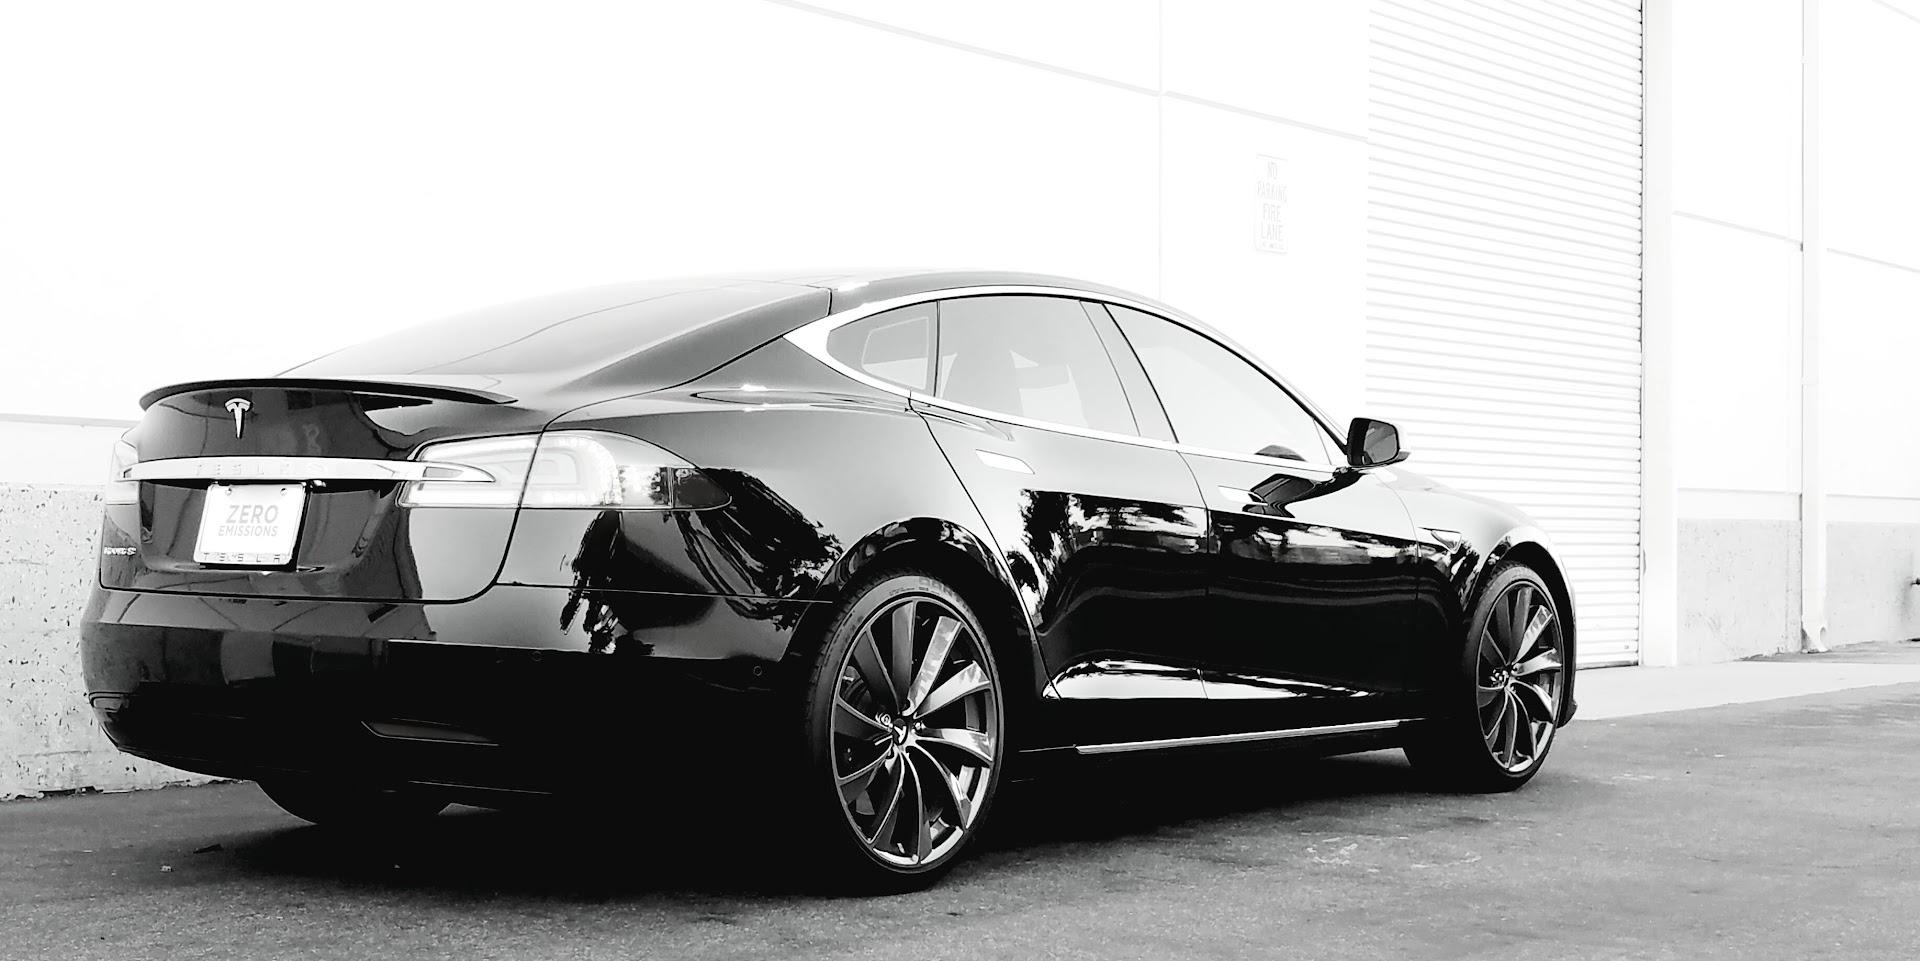 Photoshoot pics of black Refresh Model S | Tesla Motors Club